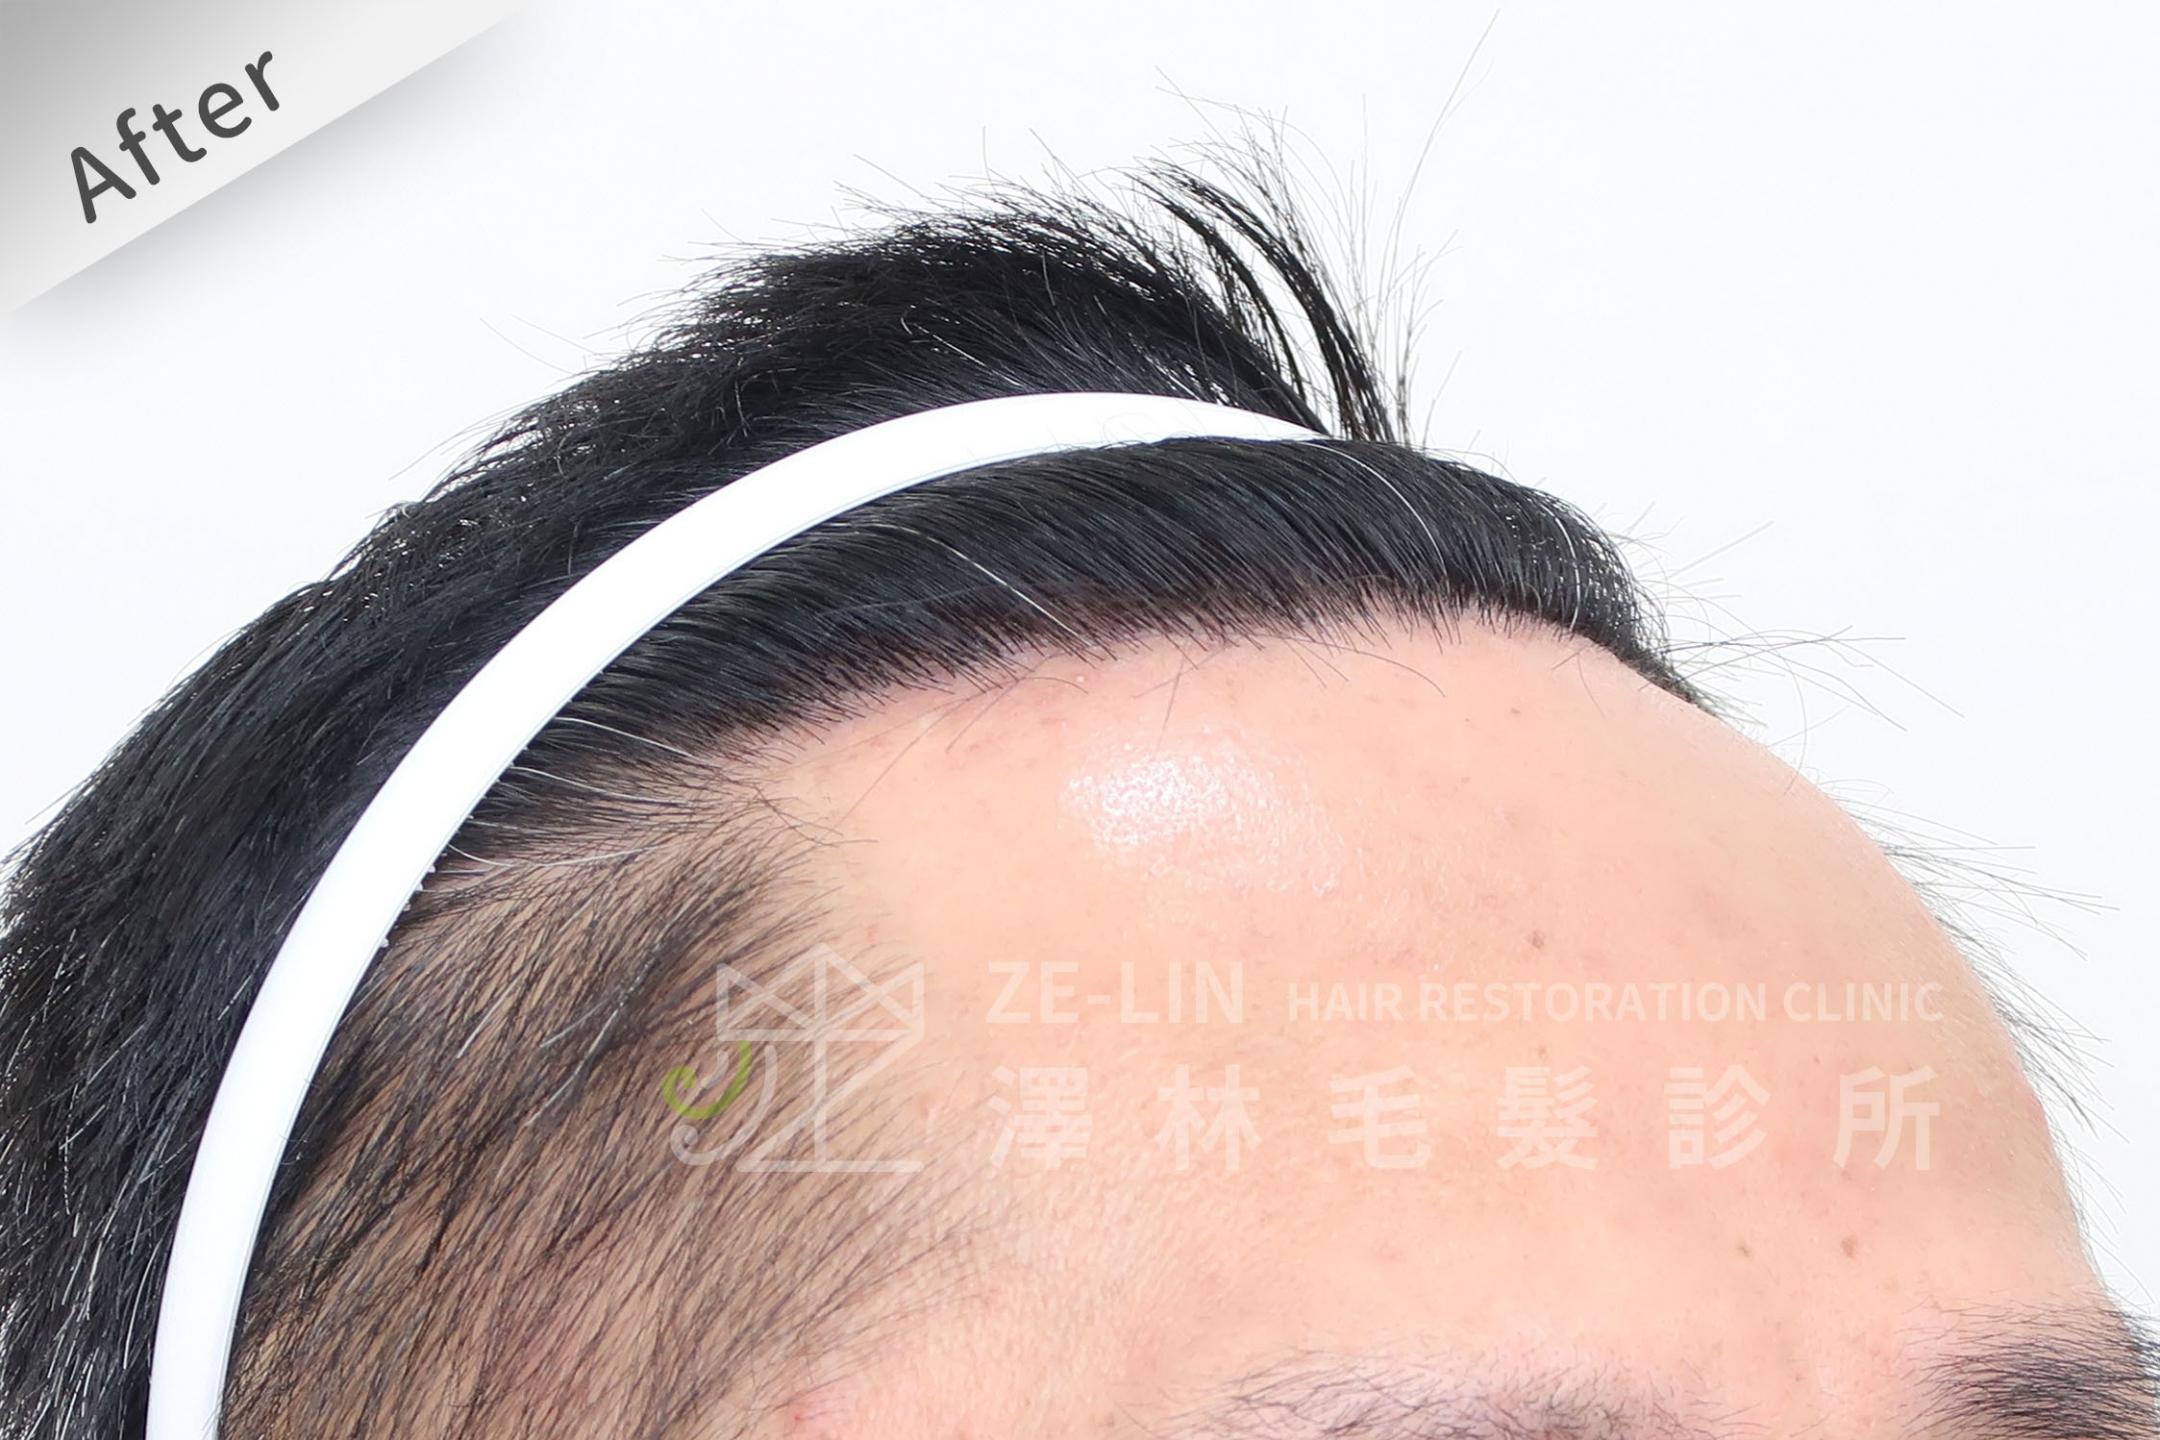 M型禿植髮心得案例分享術後6-2